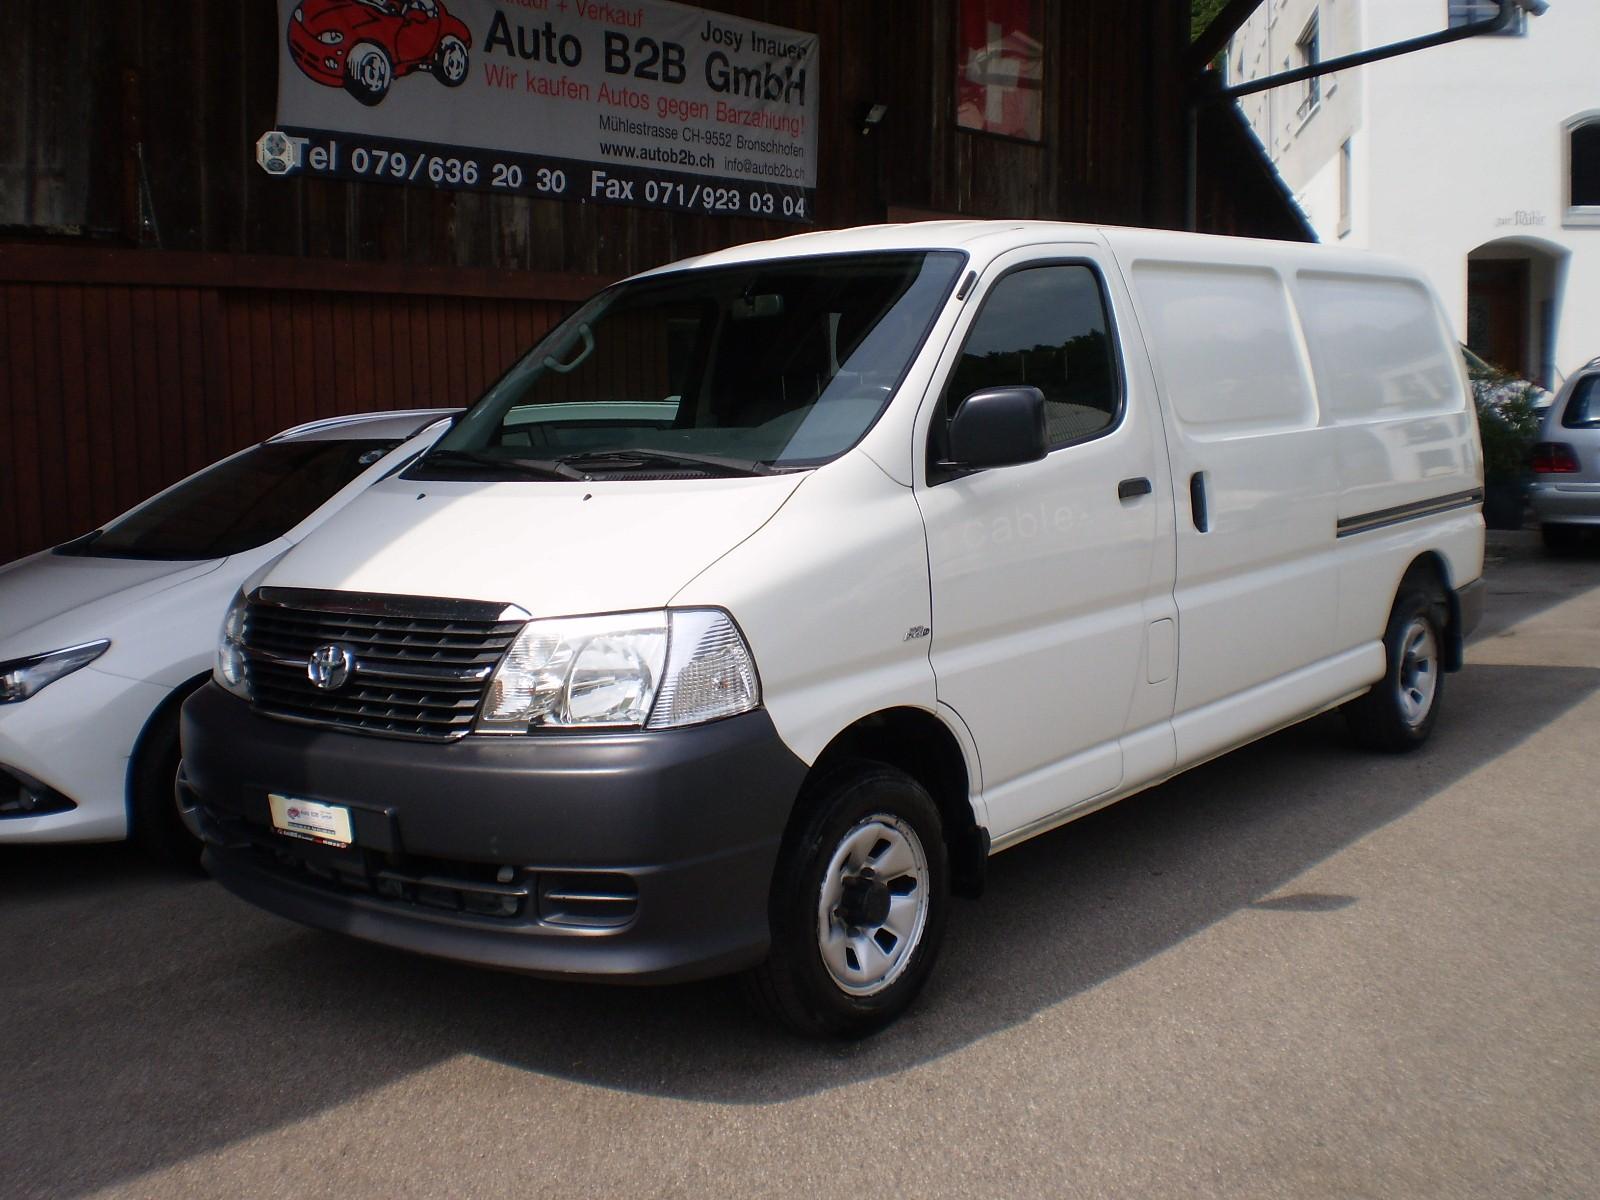 bus Toyota Hiace D-4D Kombi4x4LangversionWerkstattwagen Sortimo